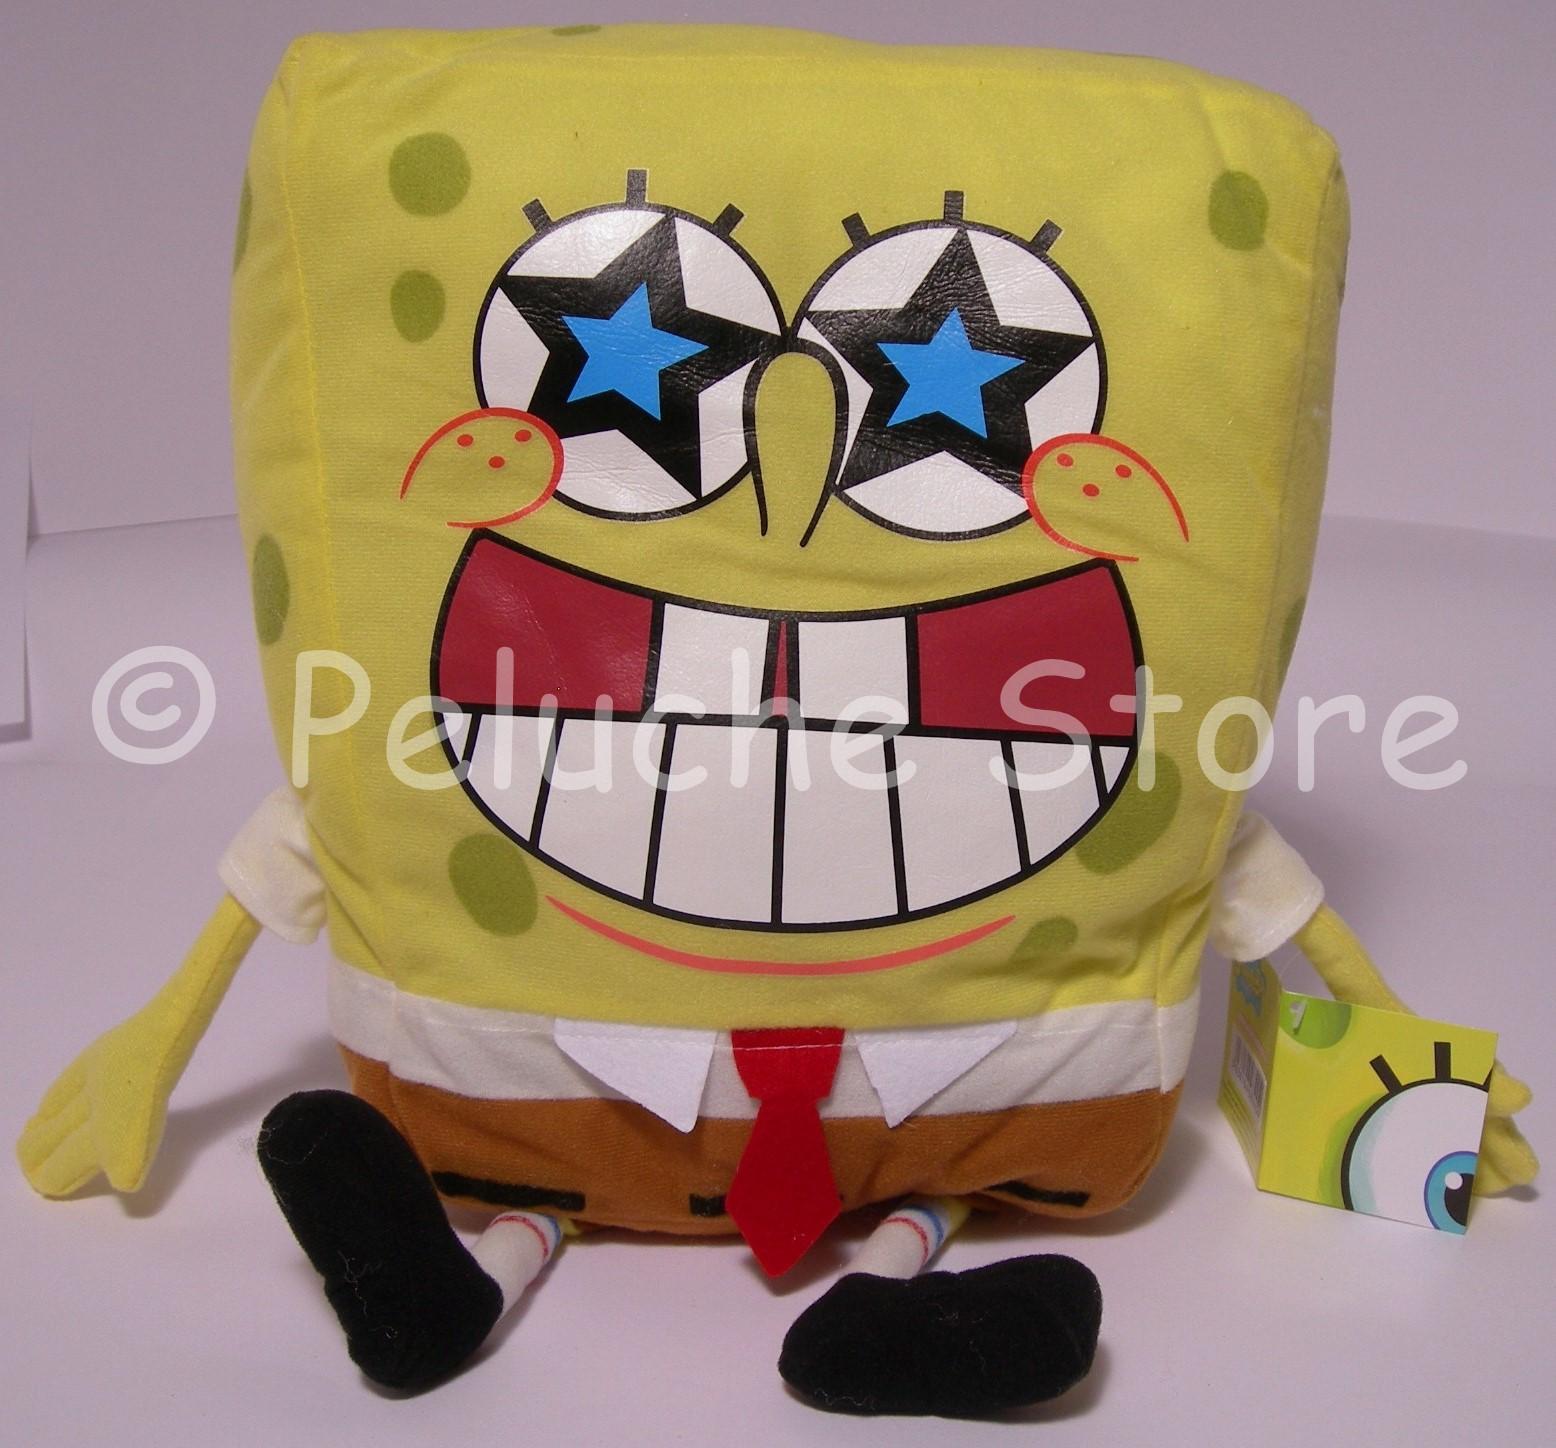 Spongebob peluche Grande 45 cm Originale La Spugna Squarepants